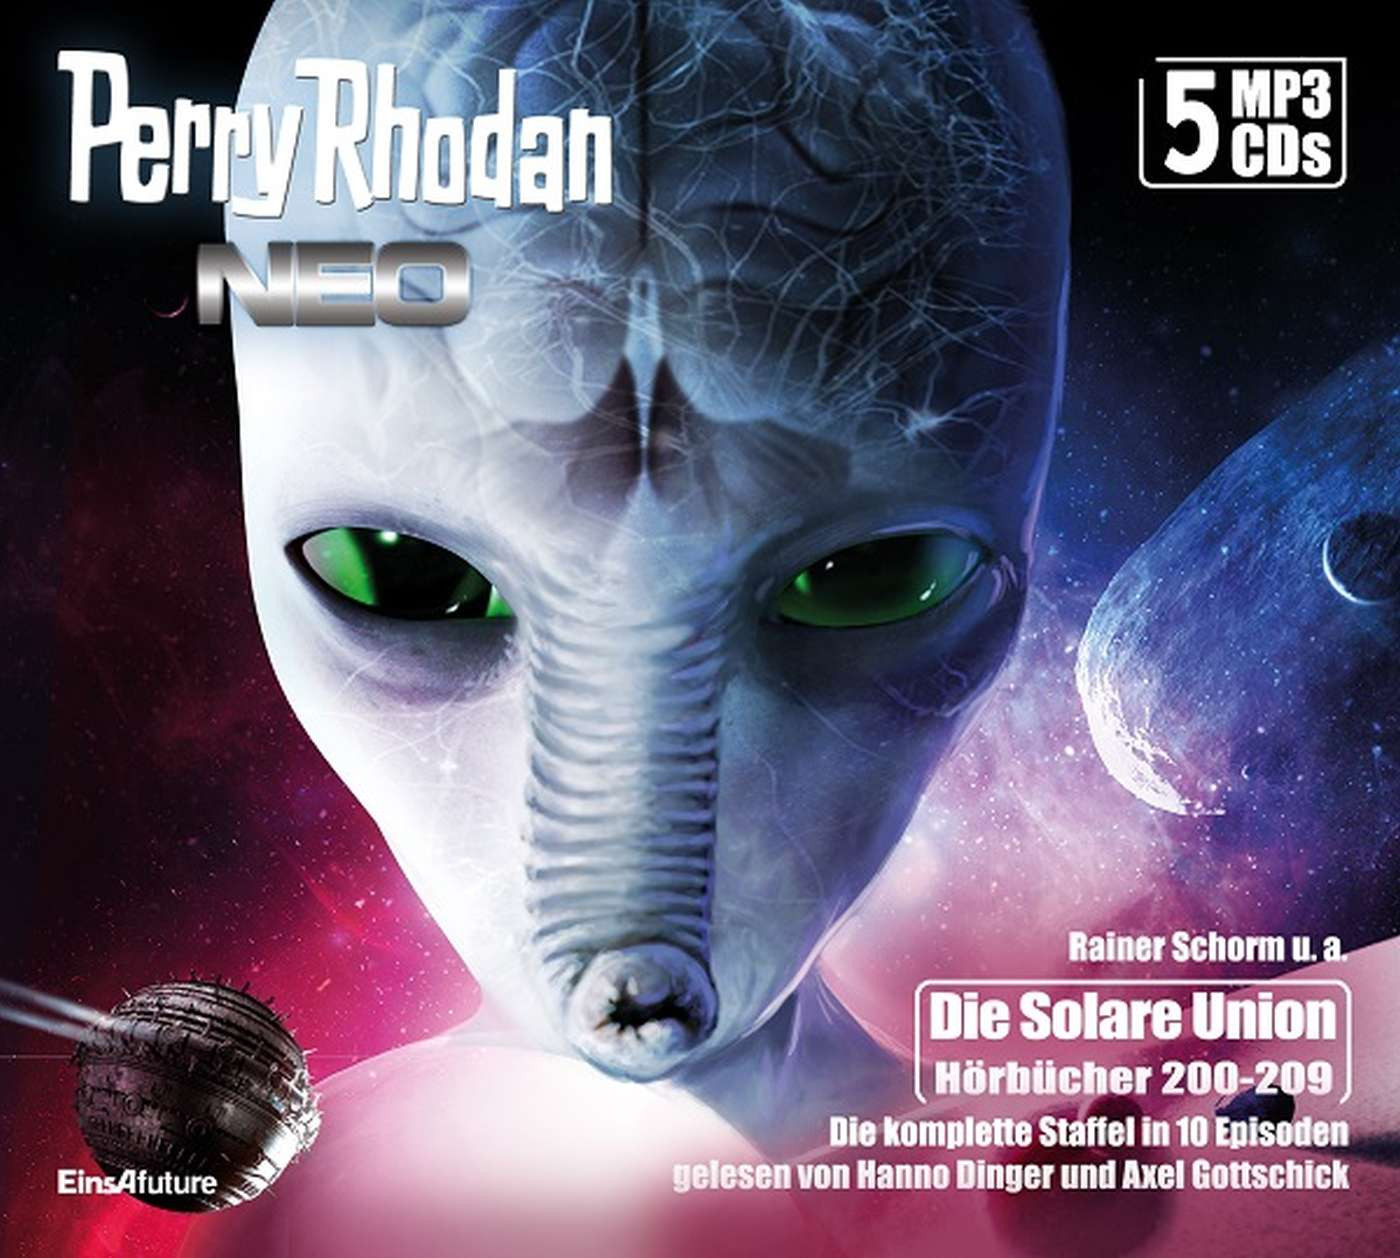 Perry Rhodan Neo MP3-CD Episoden 200-209  (5 CD-Box)